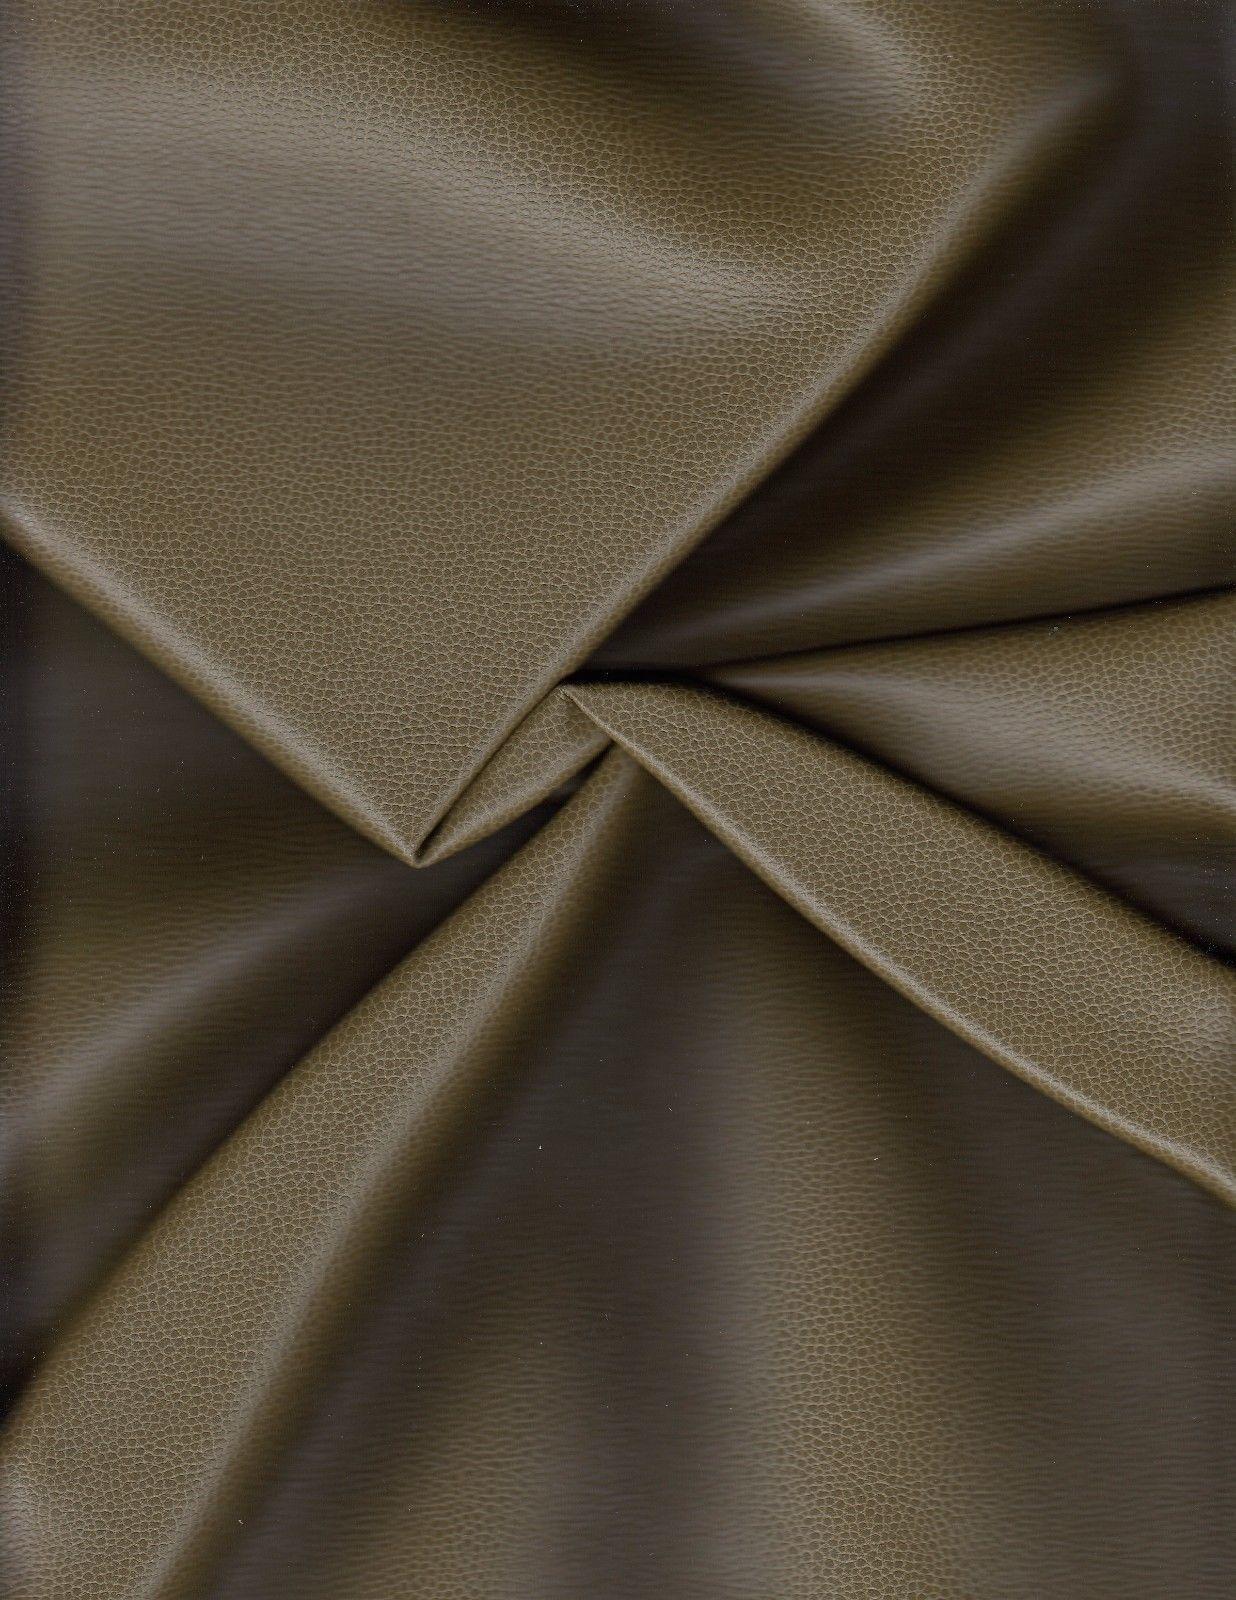 Ultrafabrics Upholstery Faux Leather 363-4514 Promessa Moss Green 2.125 yds T-11